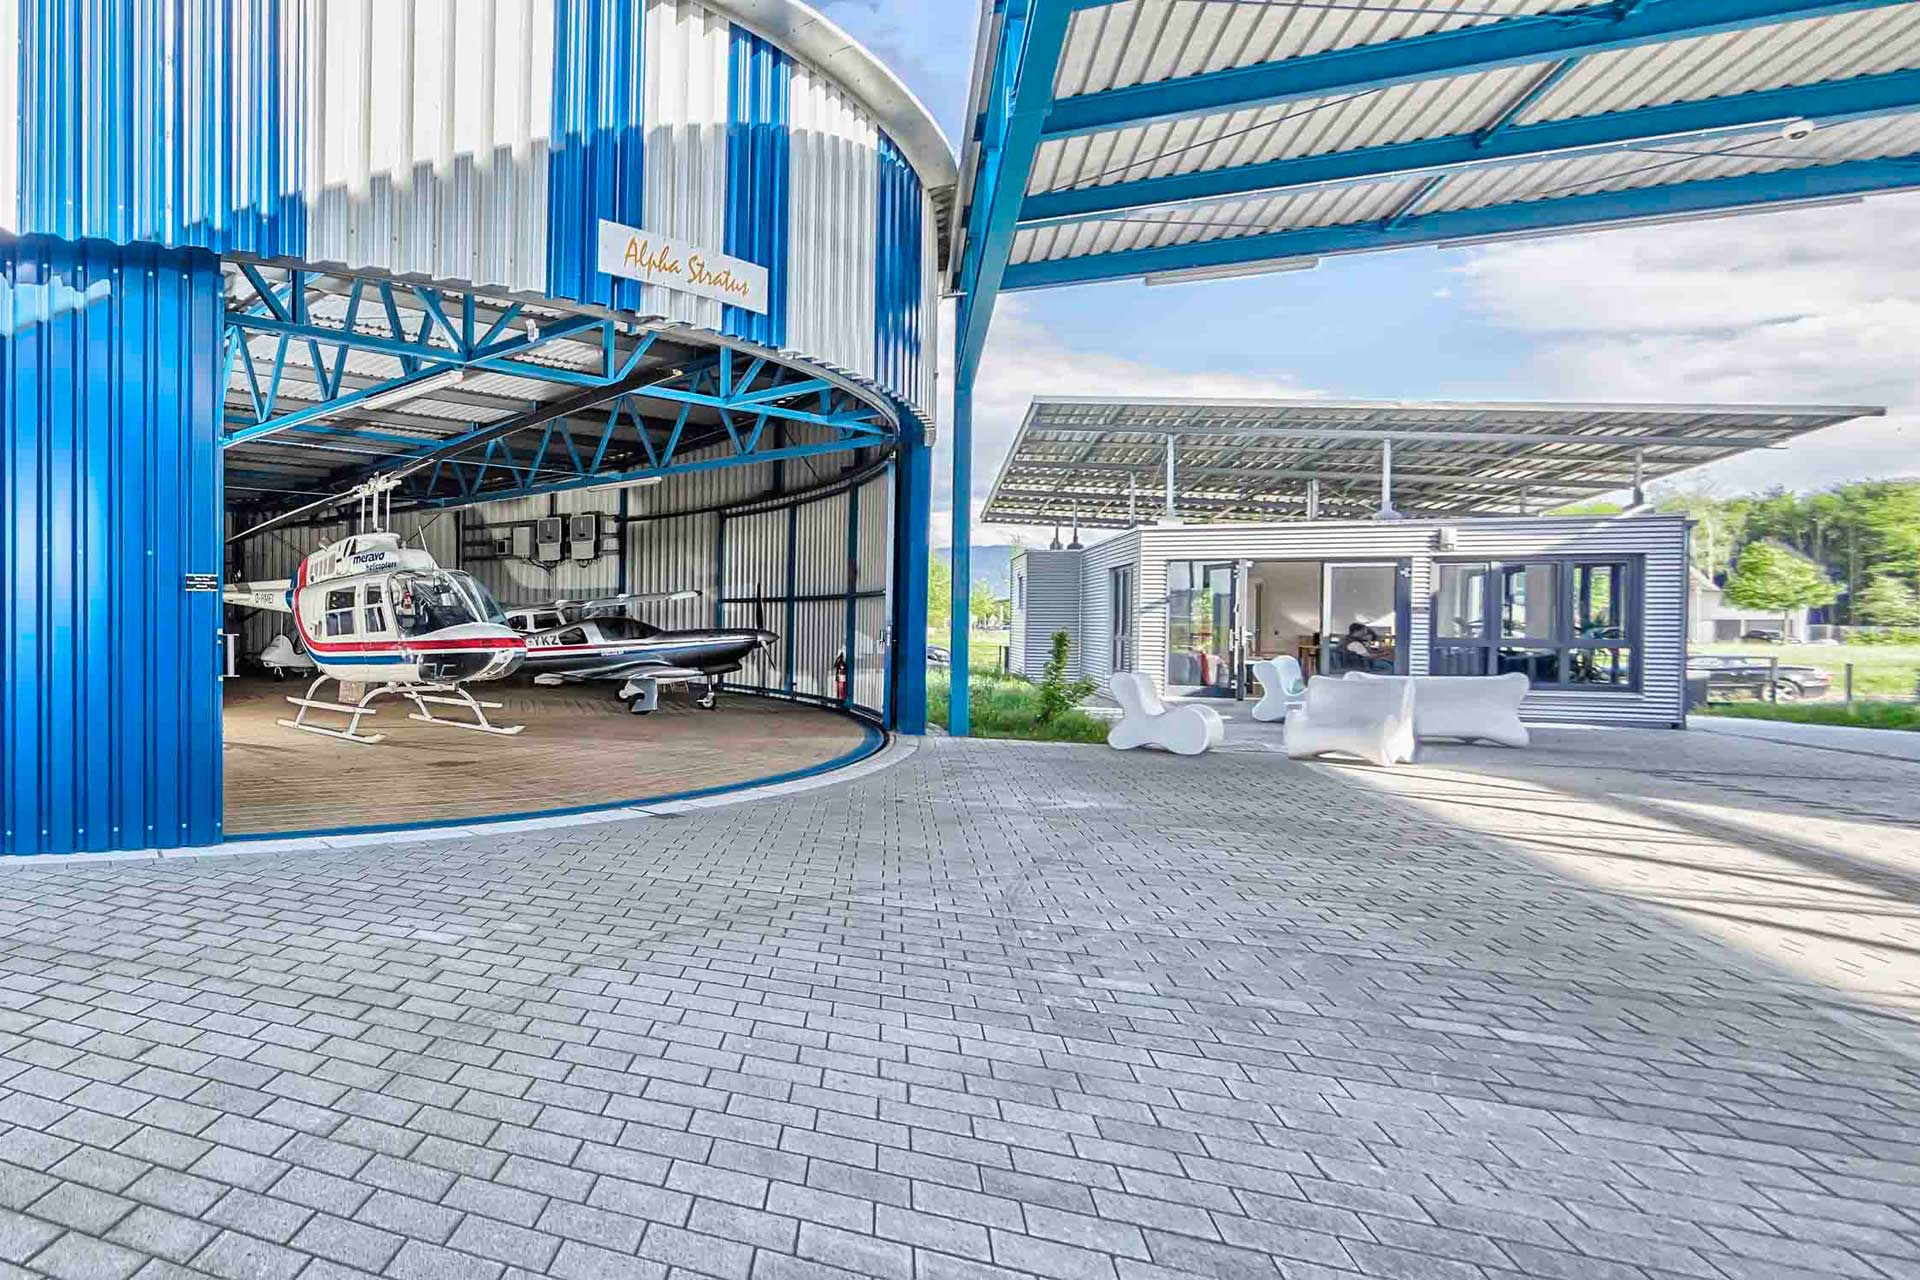 Hangar-im-Breisgauring